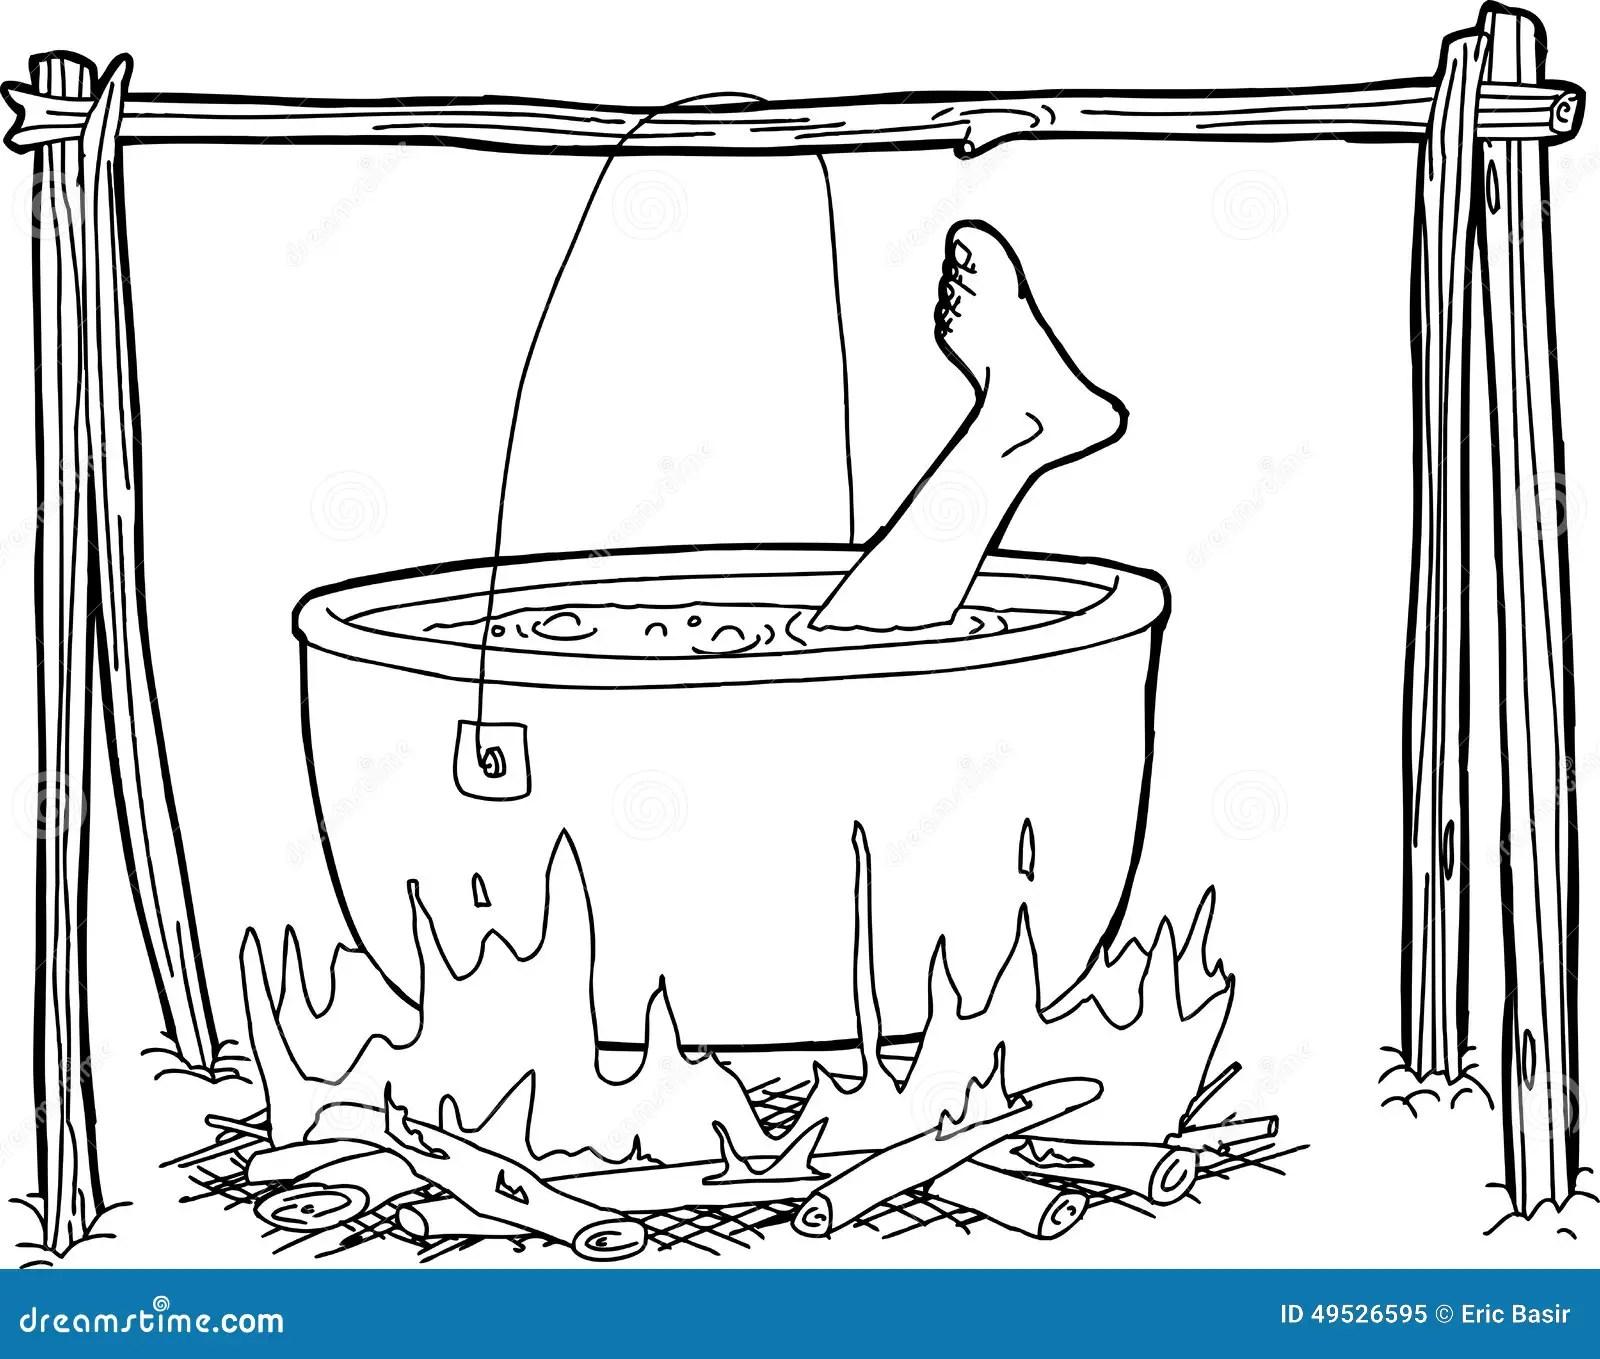 Cauldron With Human Foot Stock Illustration